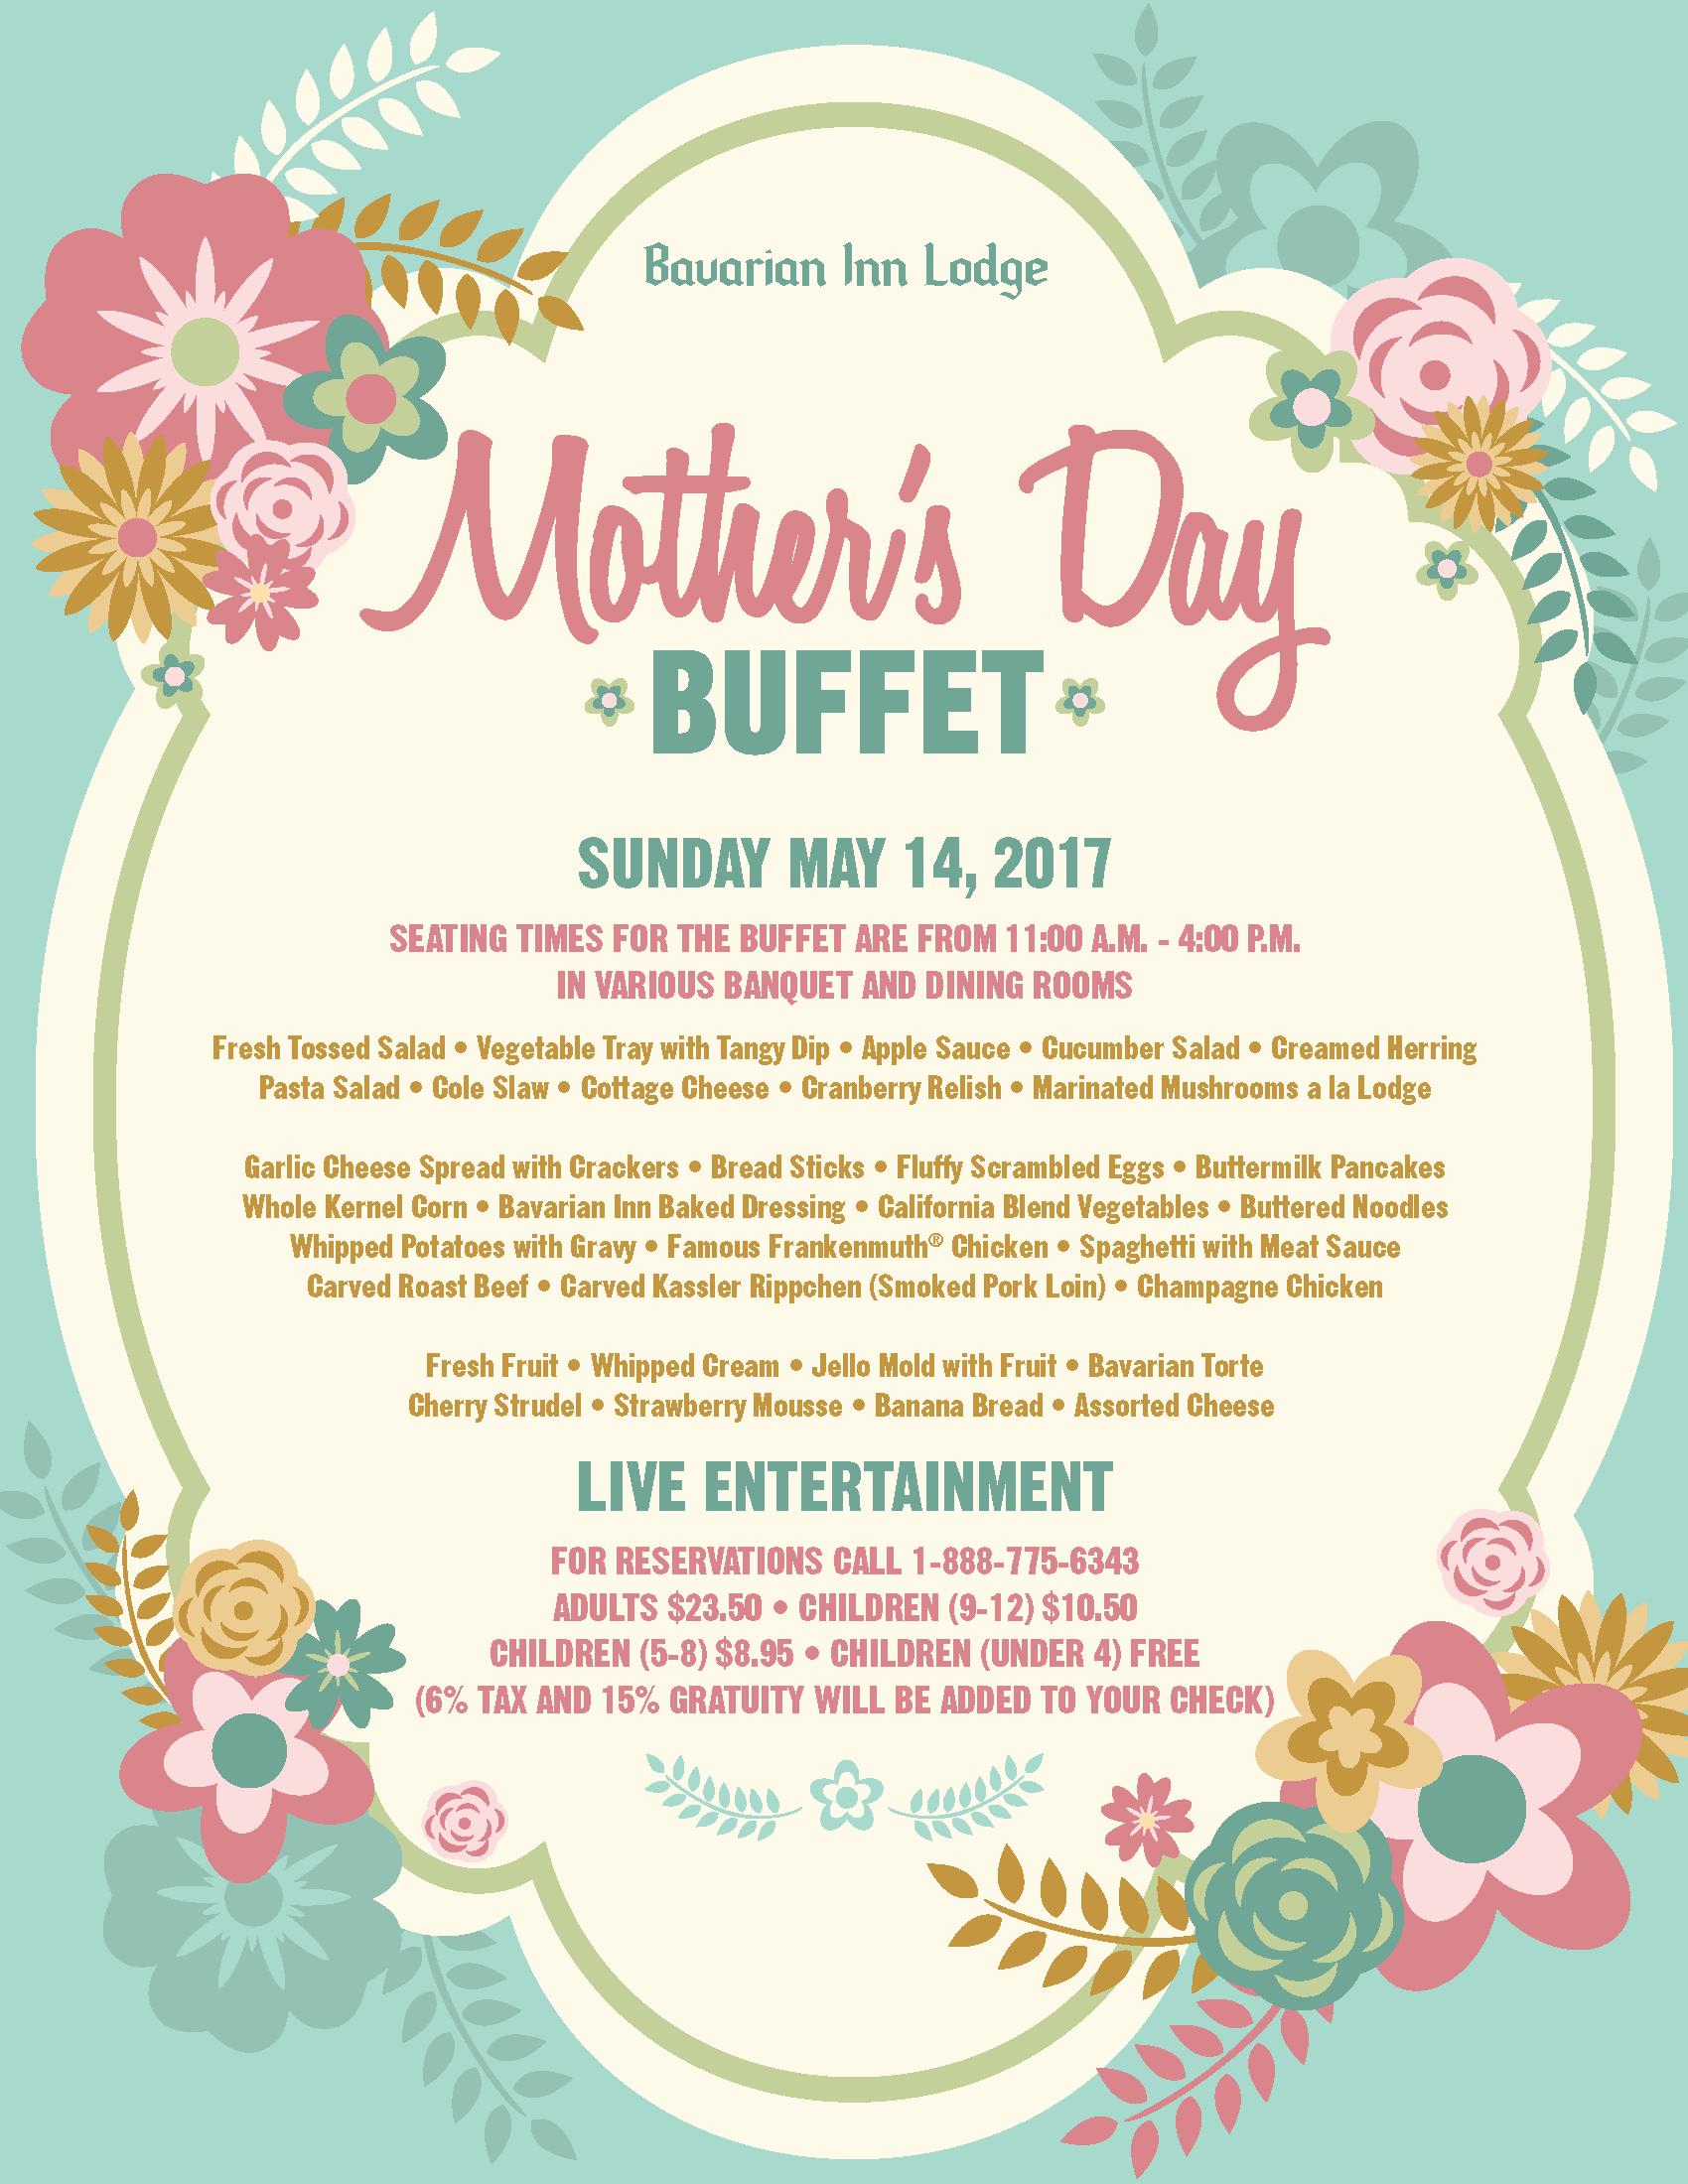 2017 Mother's Day Buffet at Bavarian Inn Lodge - Bavarian Inn